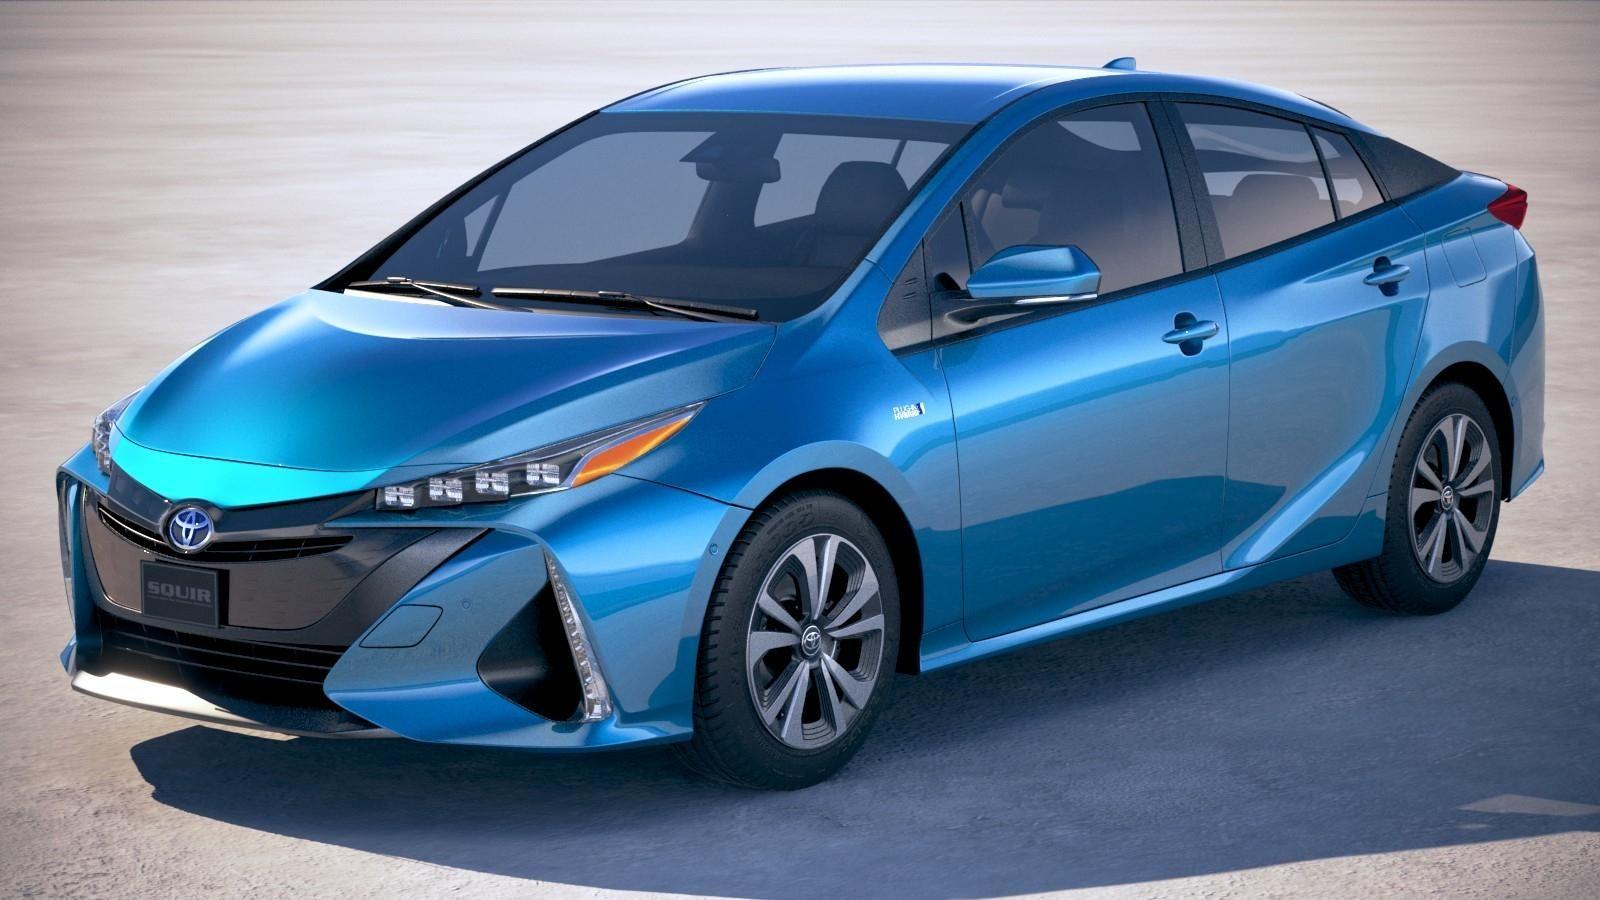 Hybrid 2017 Toyota Prius C Hatchback Gets Fresh Styling Standard